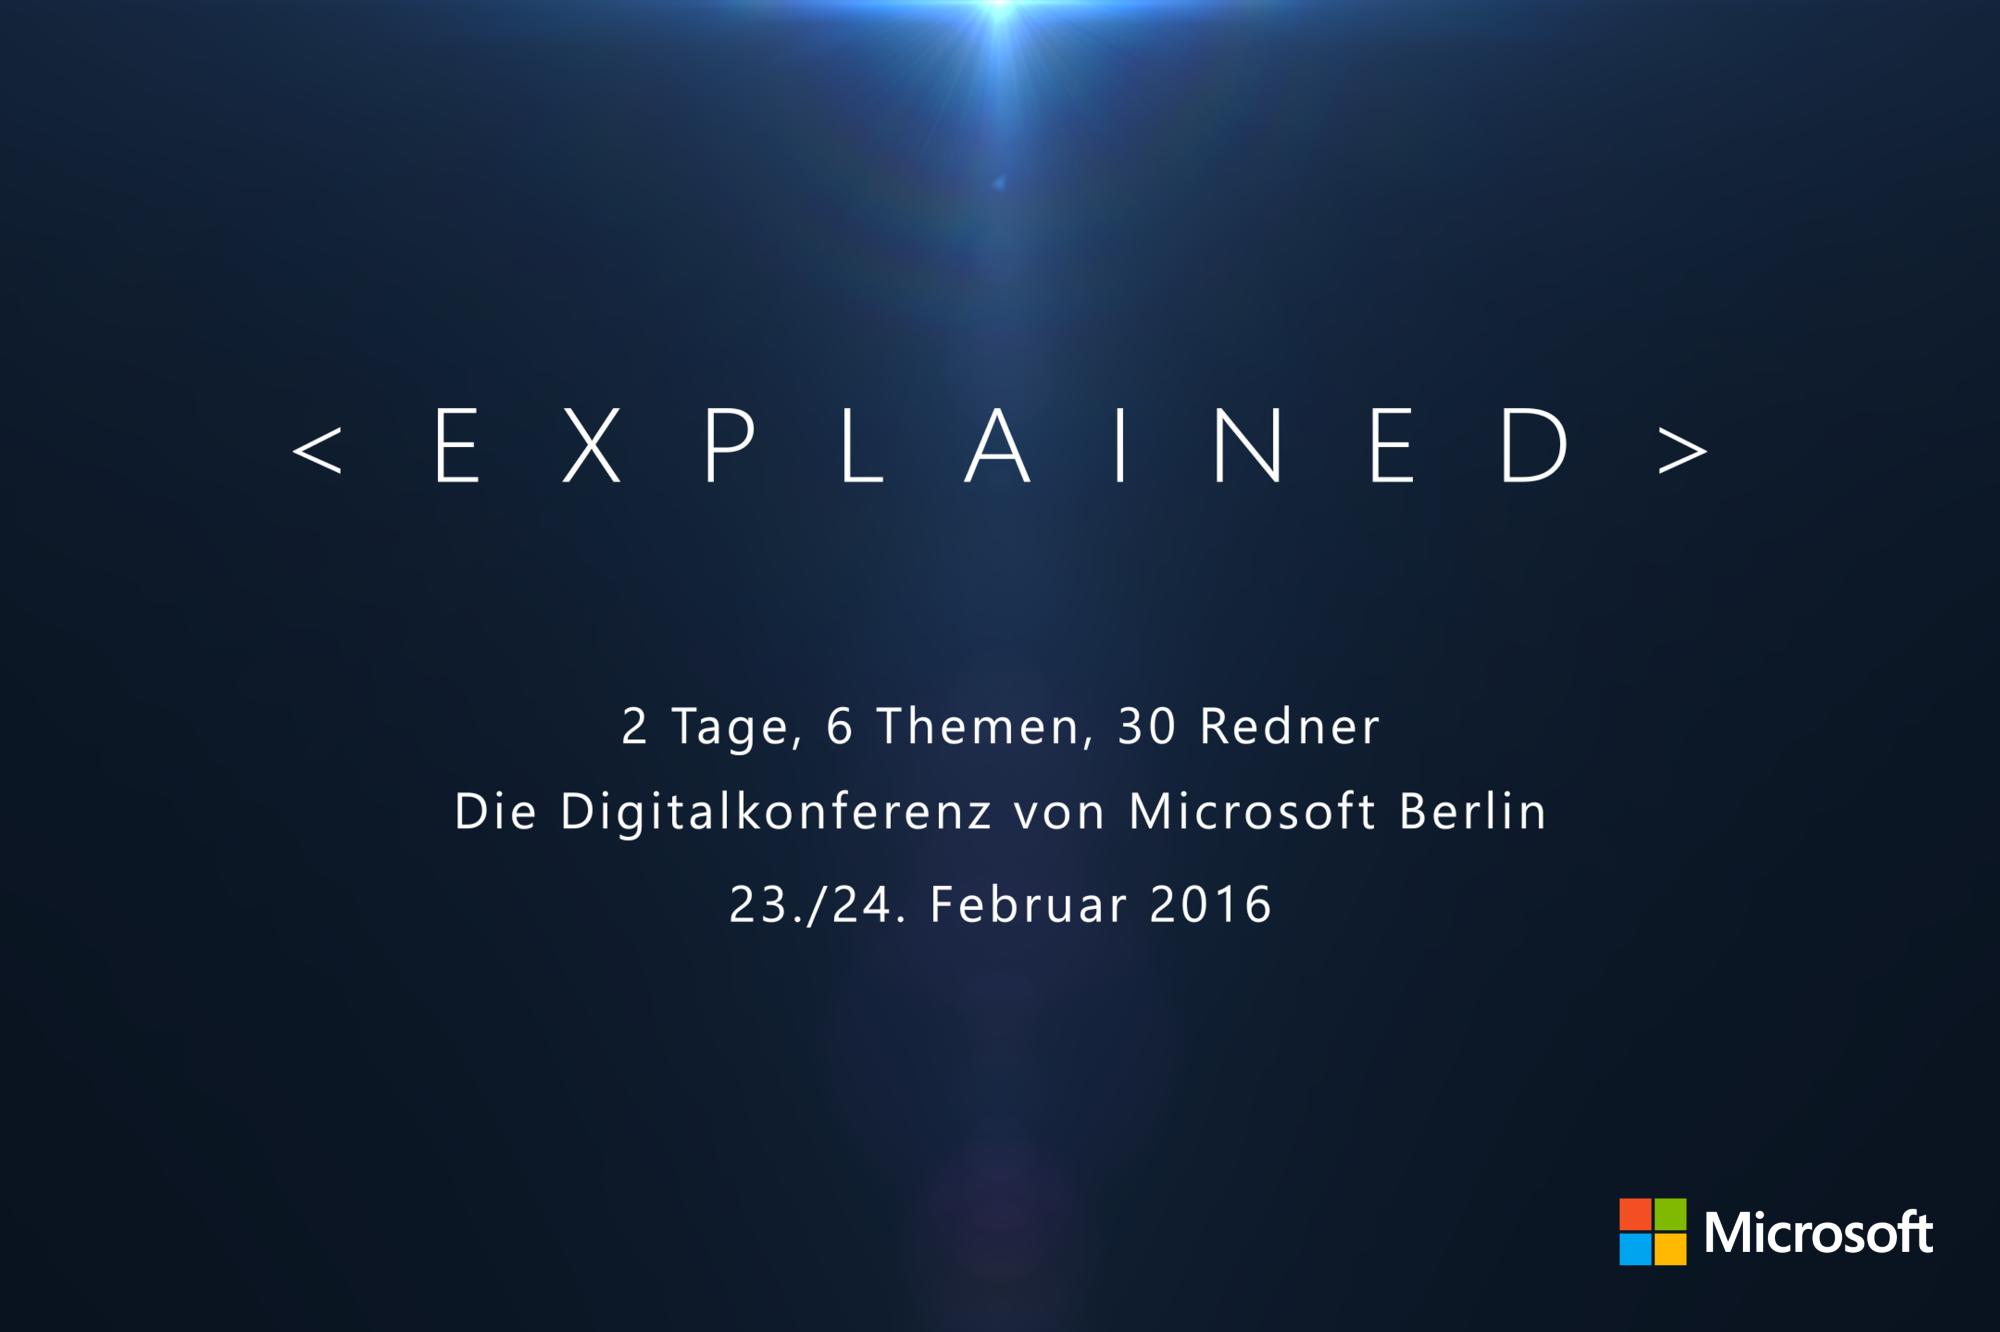 EXPLAINED von Microsoft Berlin